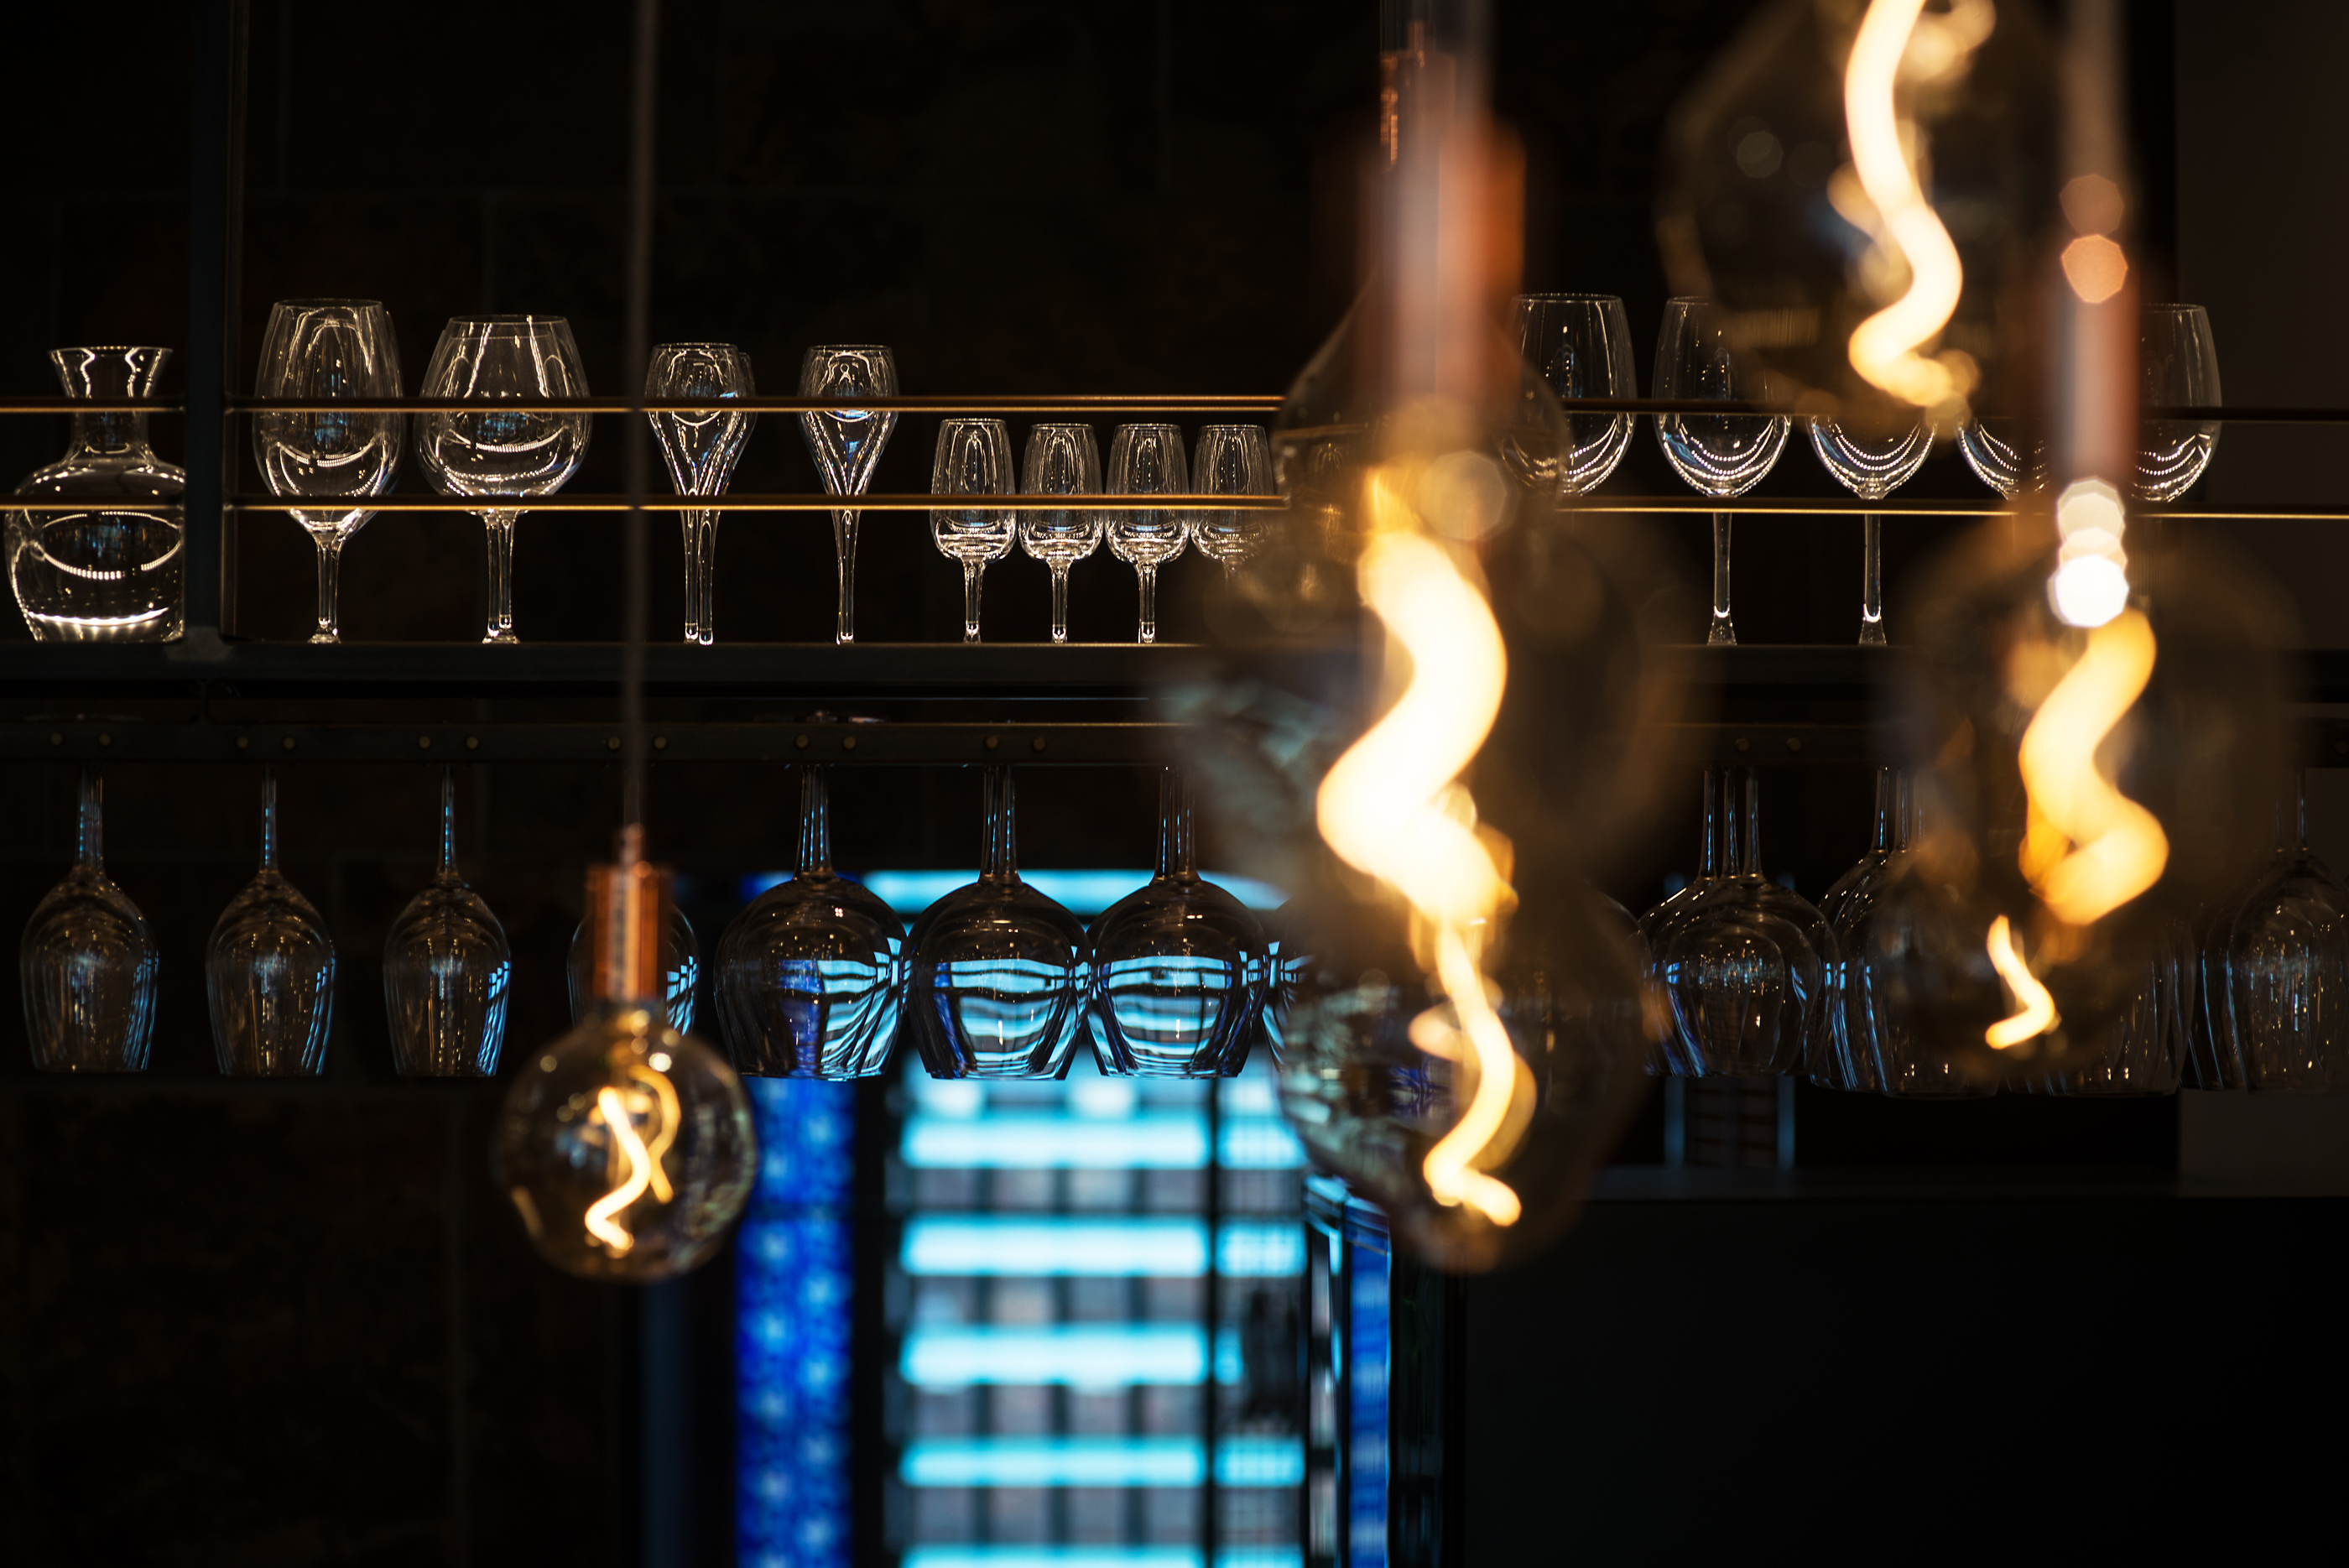 Restaurant lights